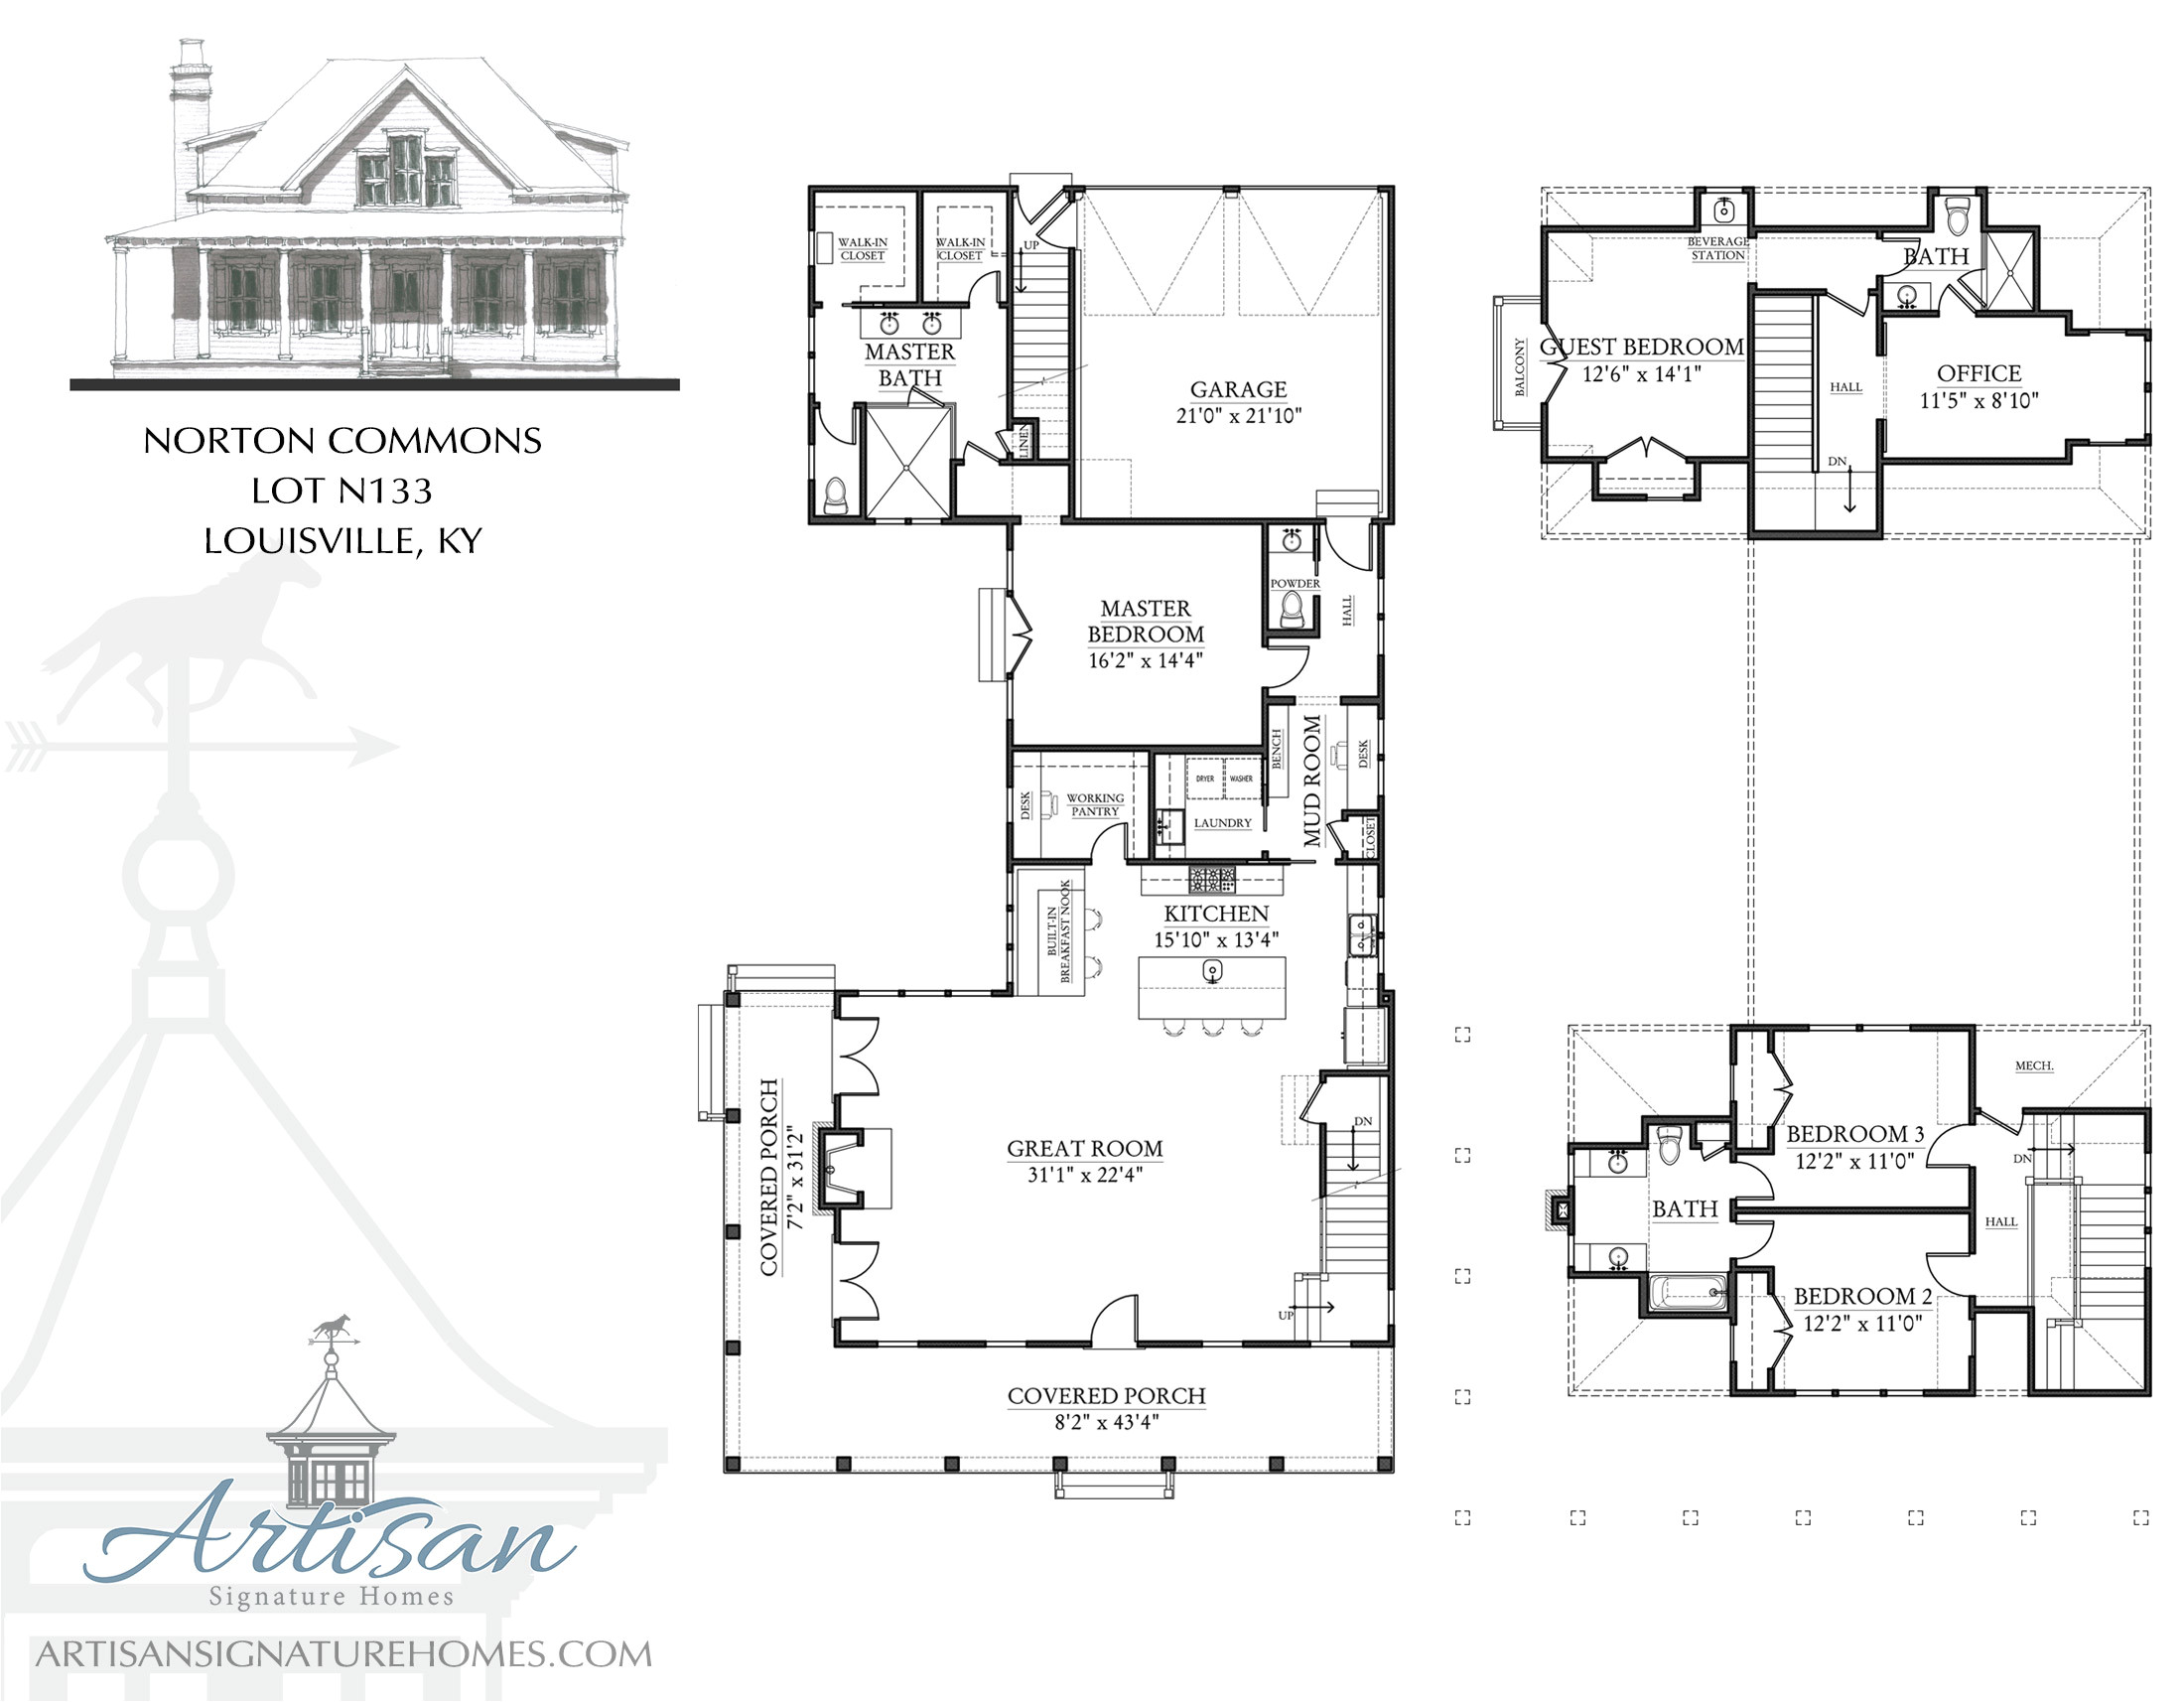 signature homes floor plans